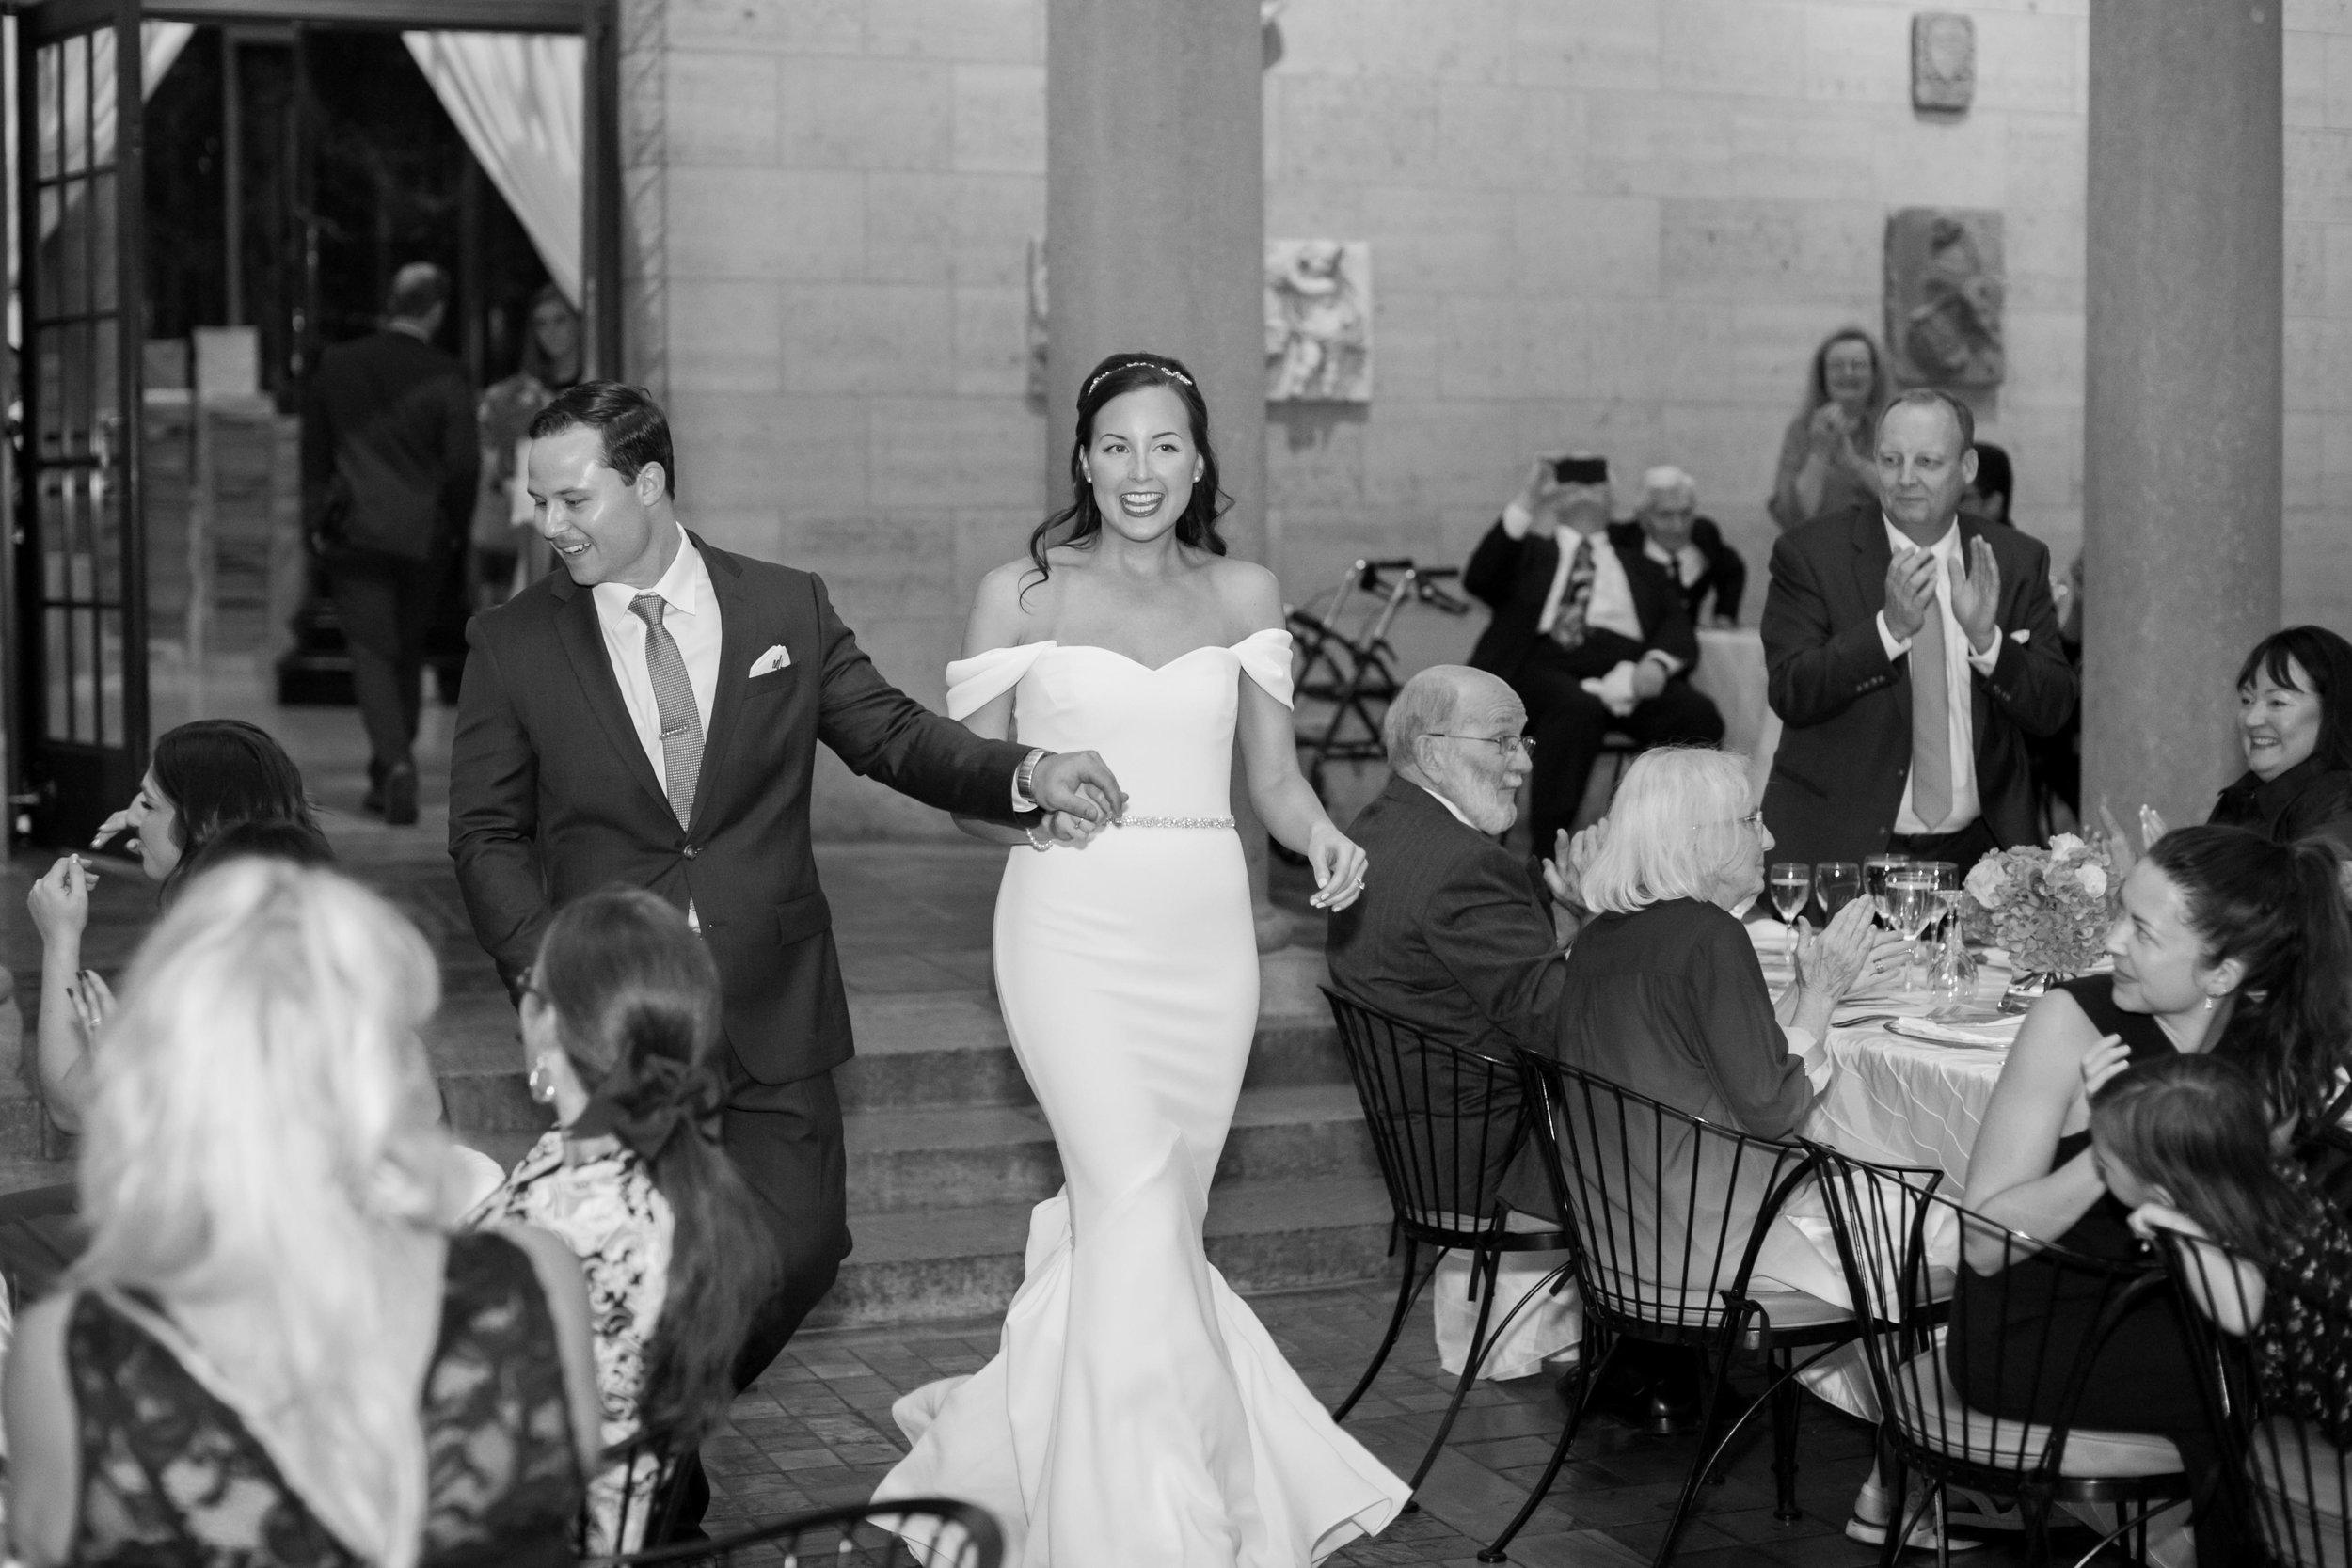 nelson-atkins-wedding-69.jpg